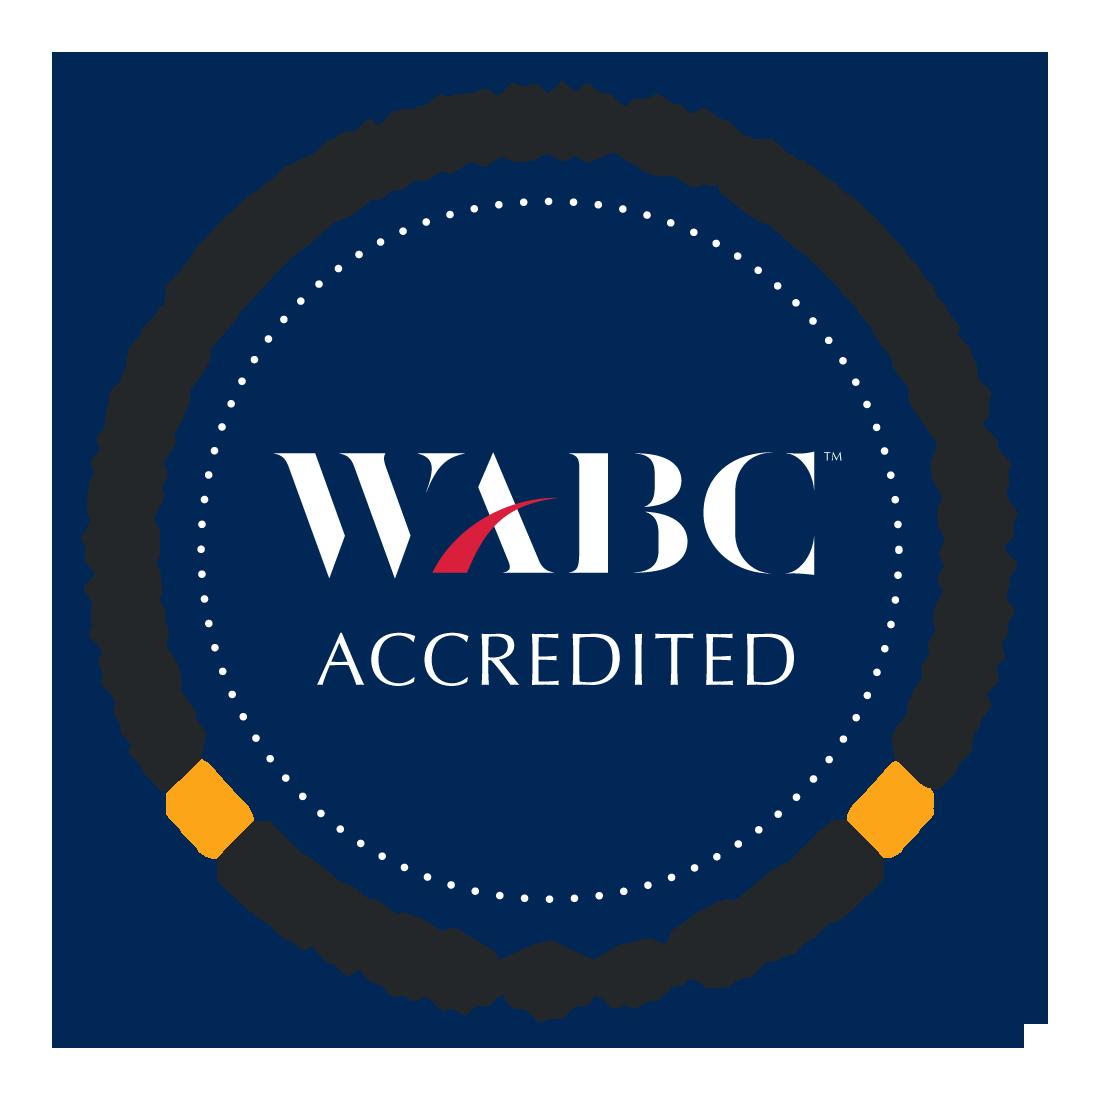 WABC Accredited (Level 1 - RCC) Badge